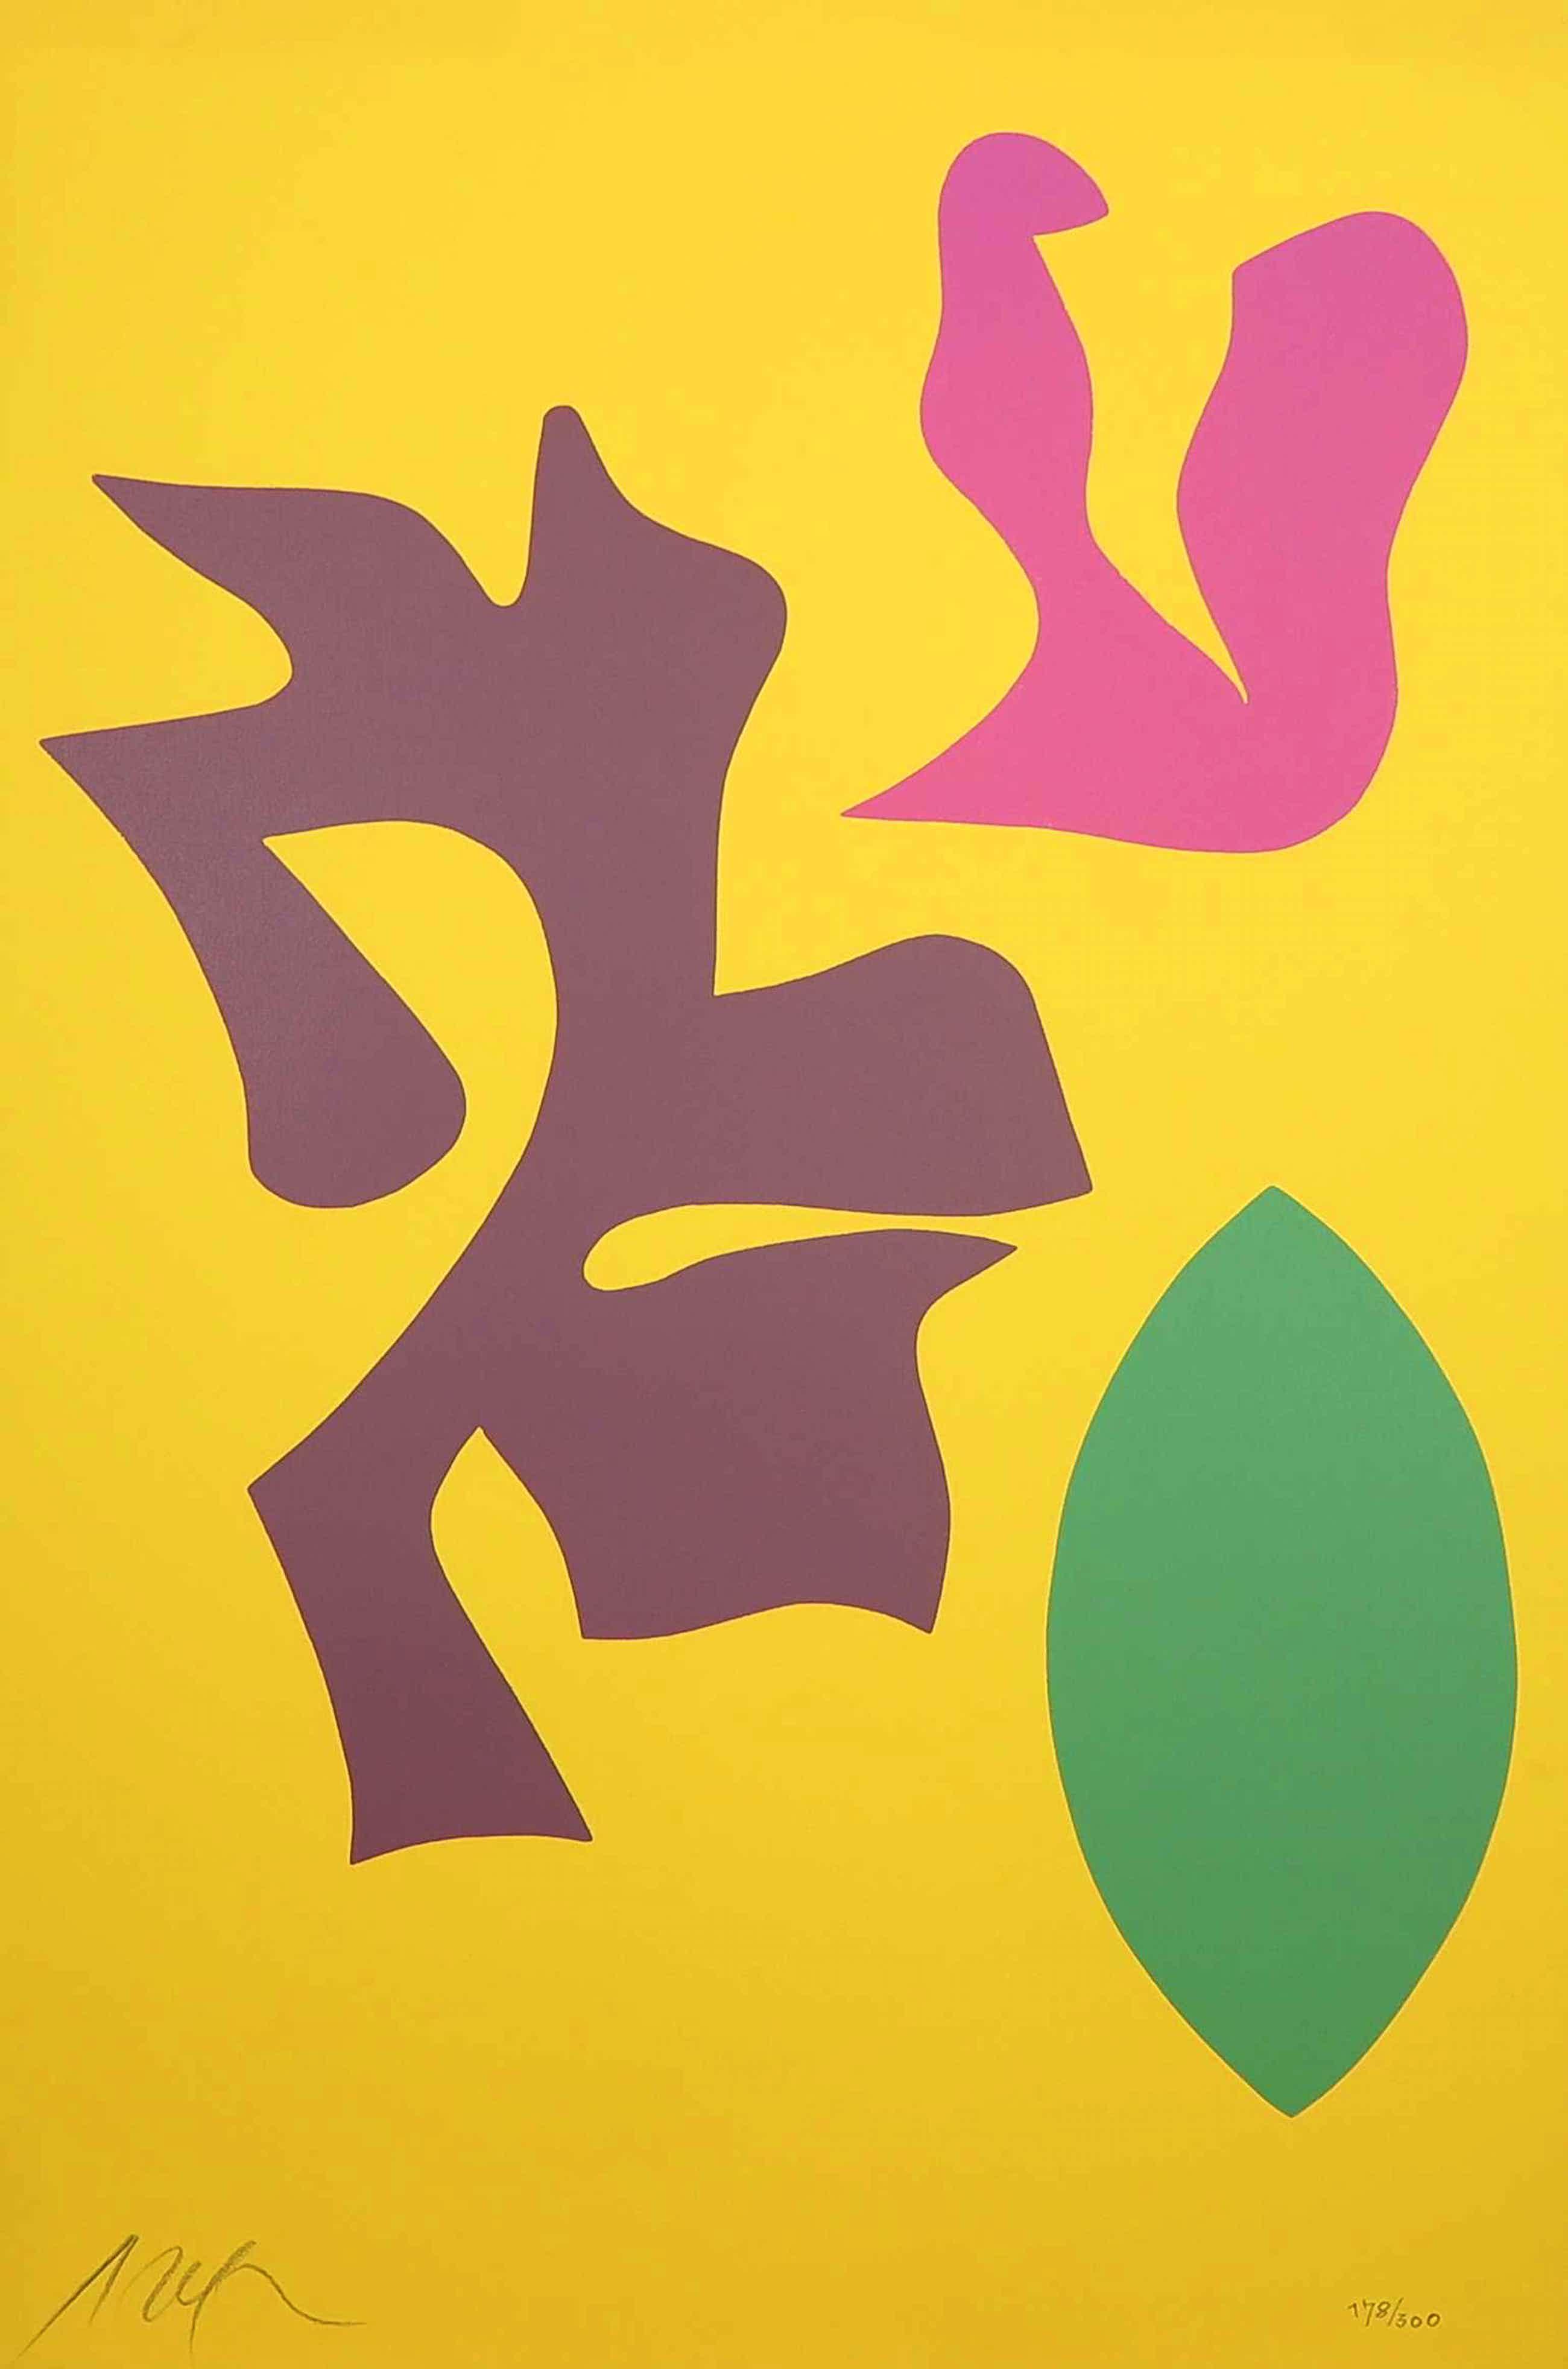 Hans Arp - Houtsnede uit portfolio Documenta Geigy. Das Unbehagen in der Kunst (1965) kopen? Bied vanaf 400!